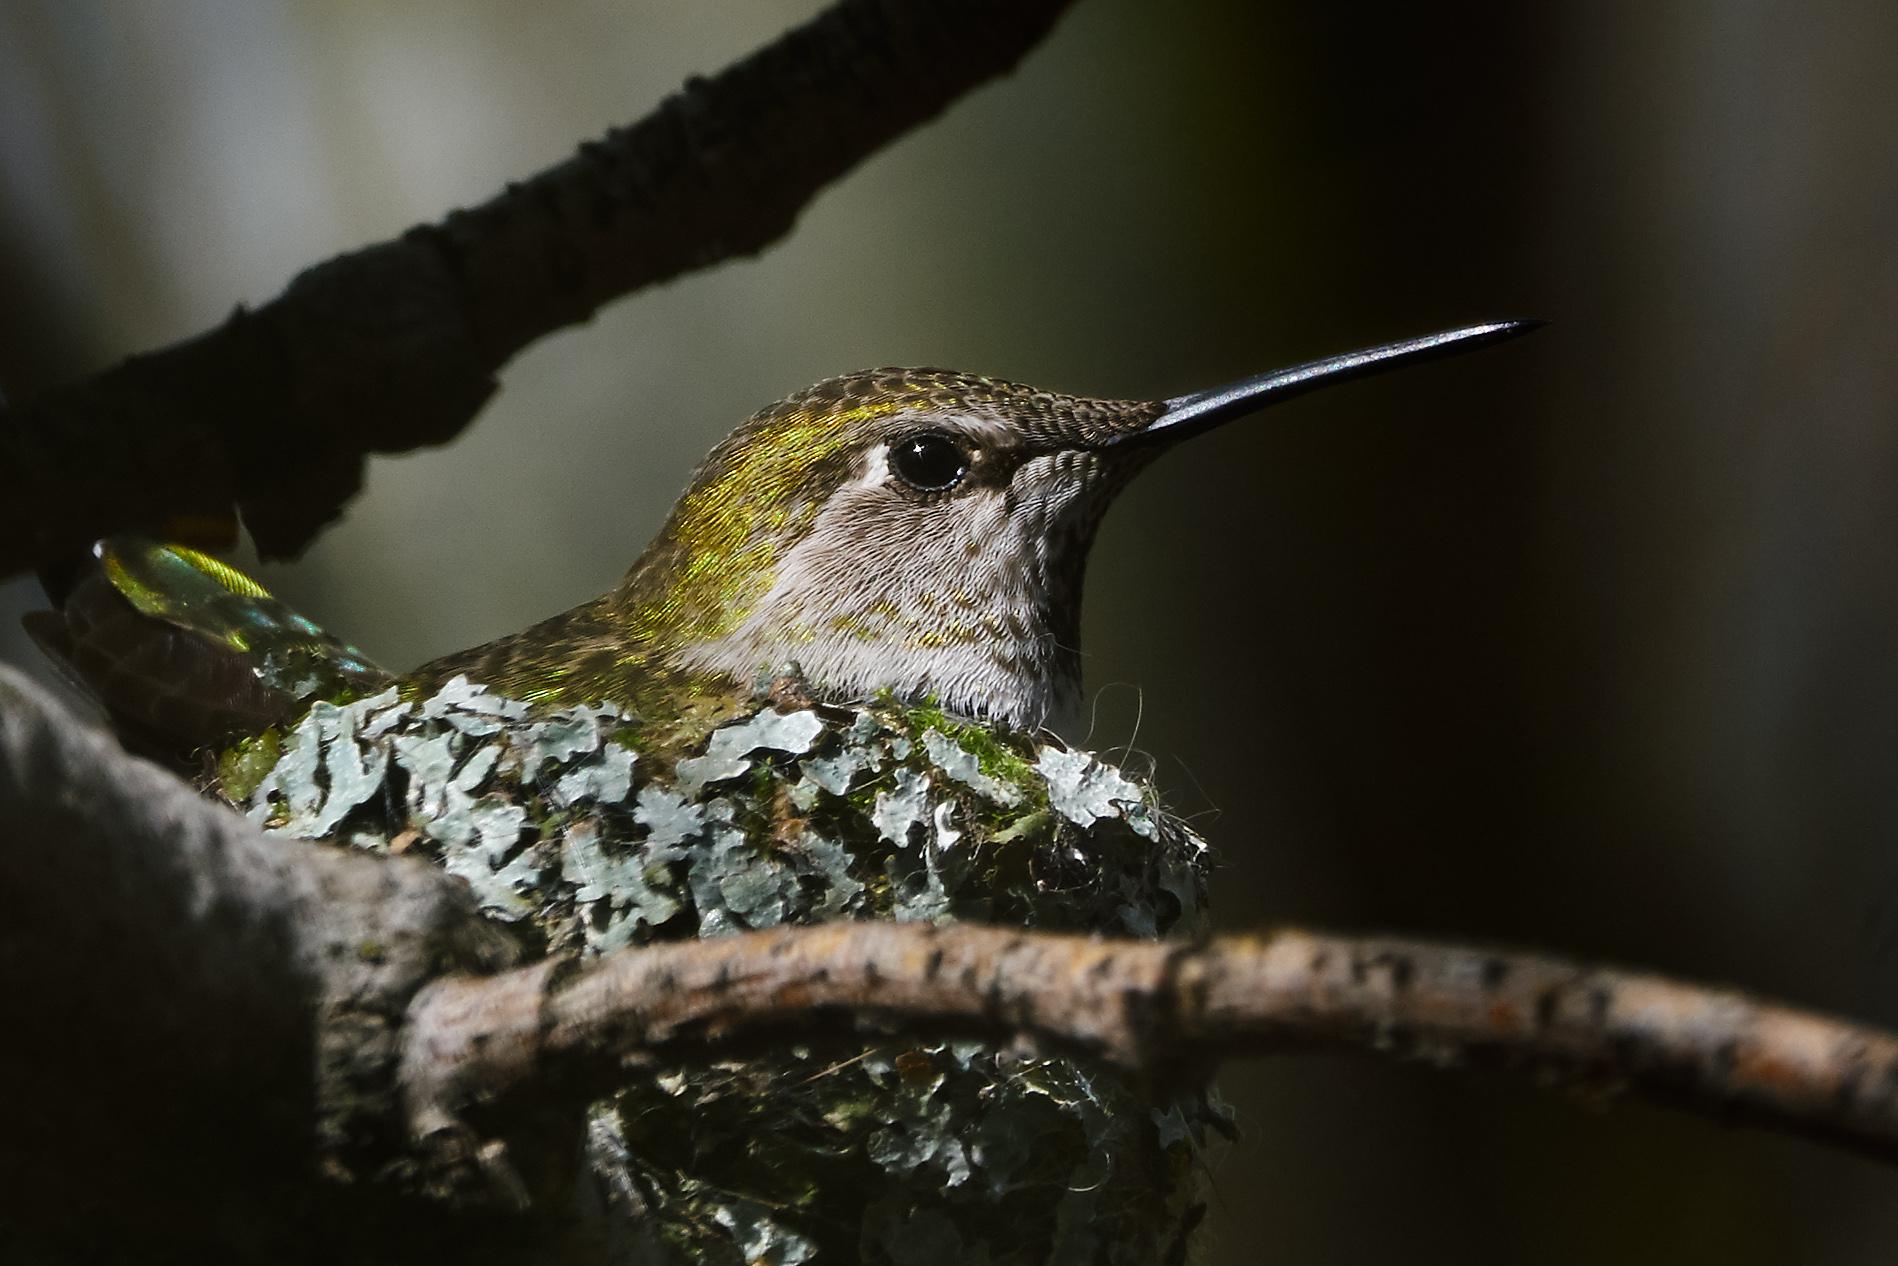 Nesting Mother